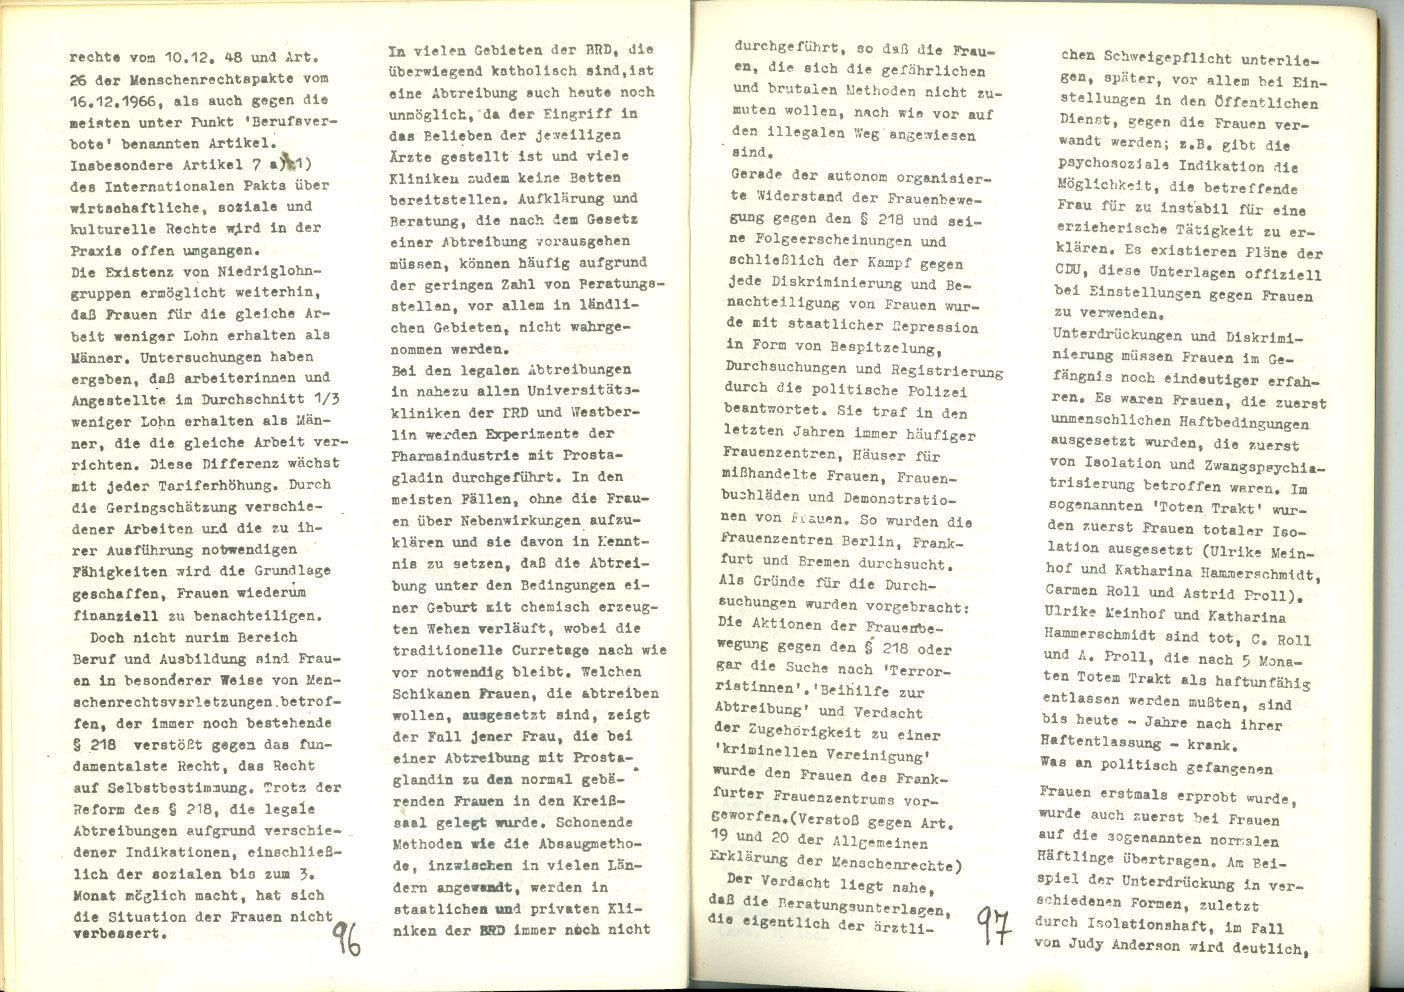 Marburg_Russell_Initiative_1978_50